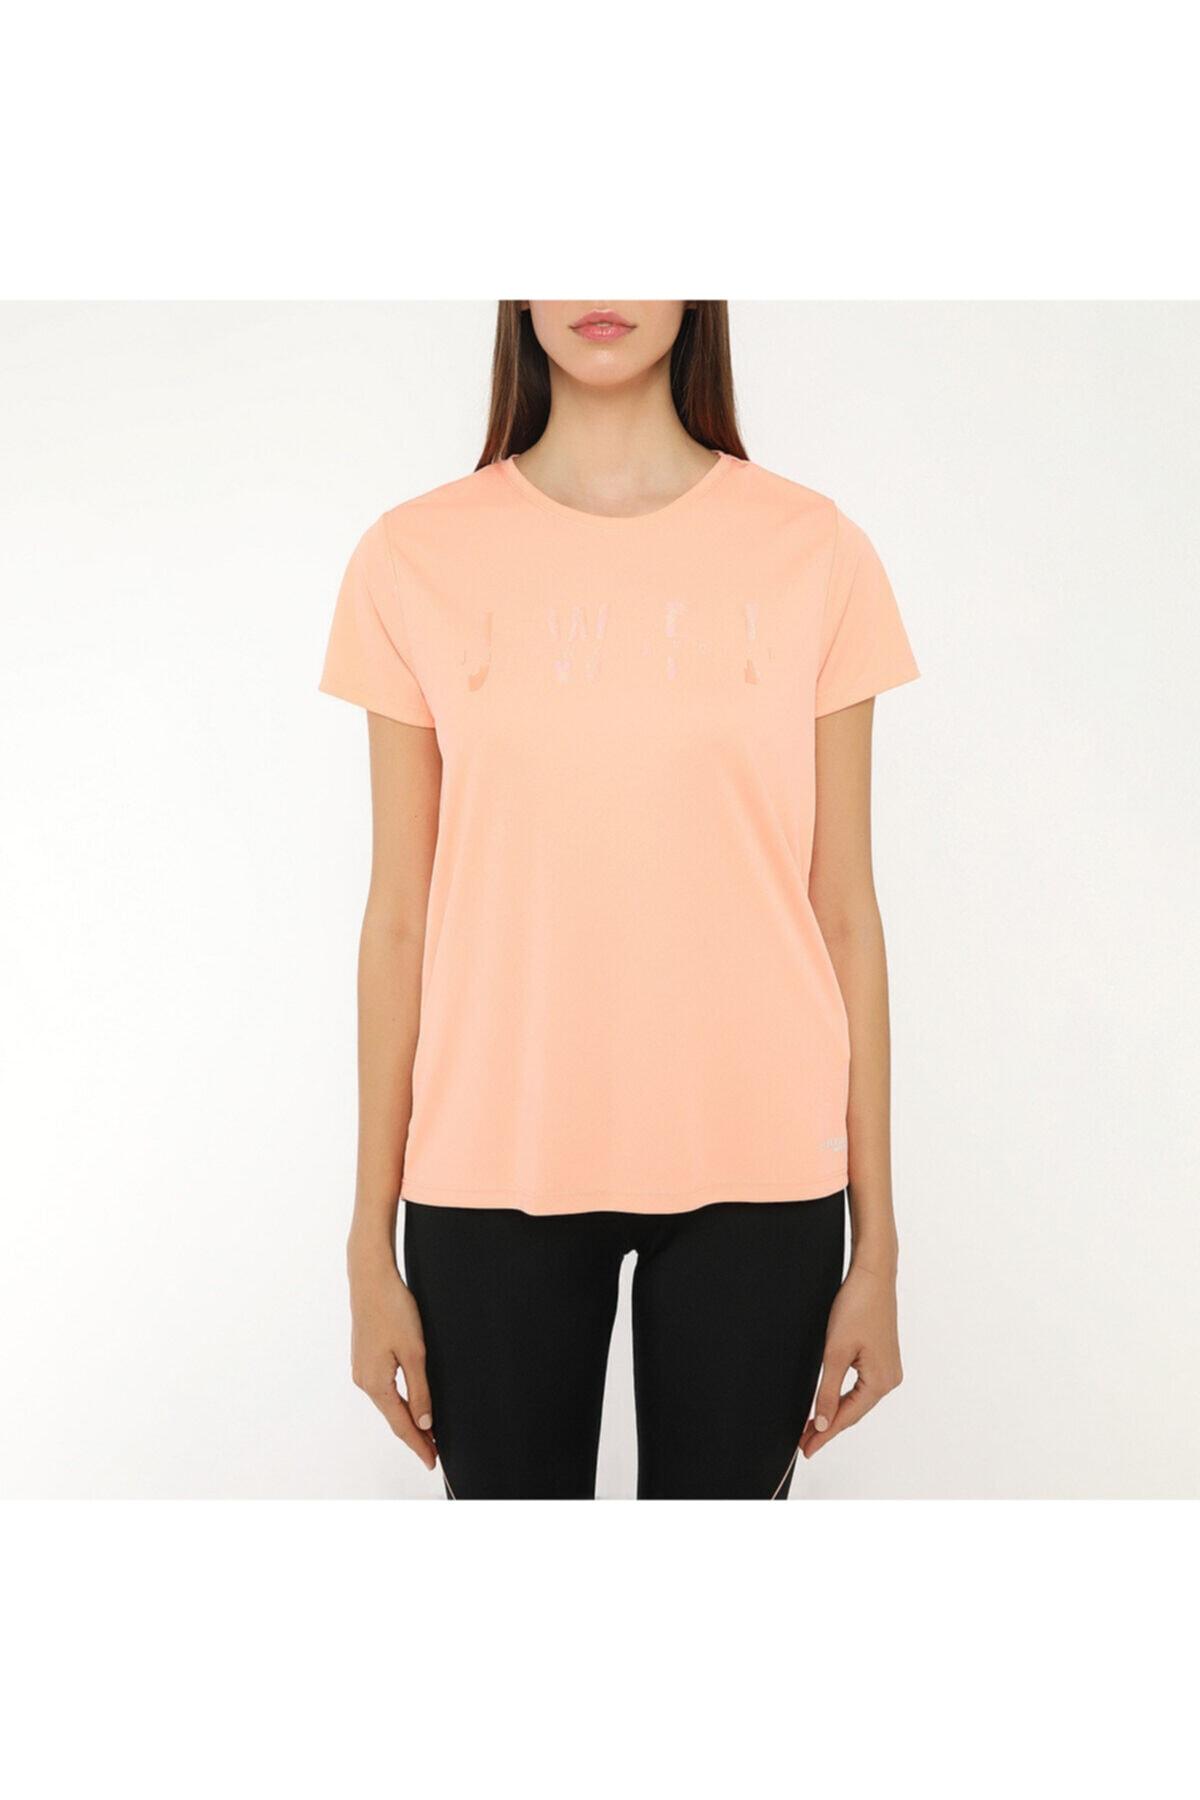 lumberjack Kadın Somon T-shirt W-18165 2